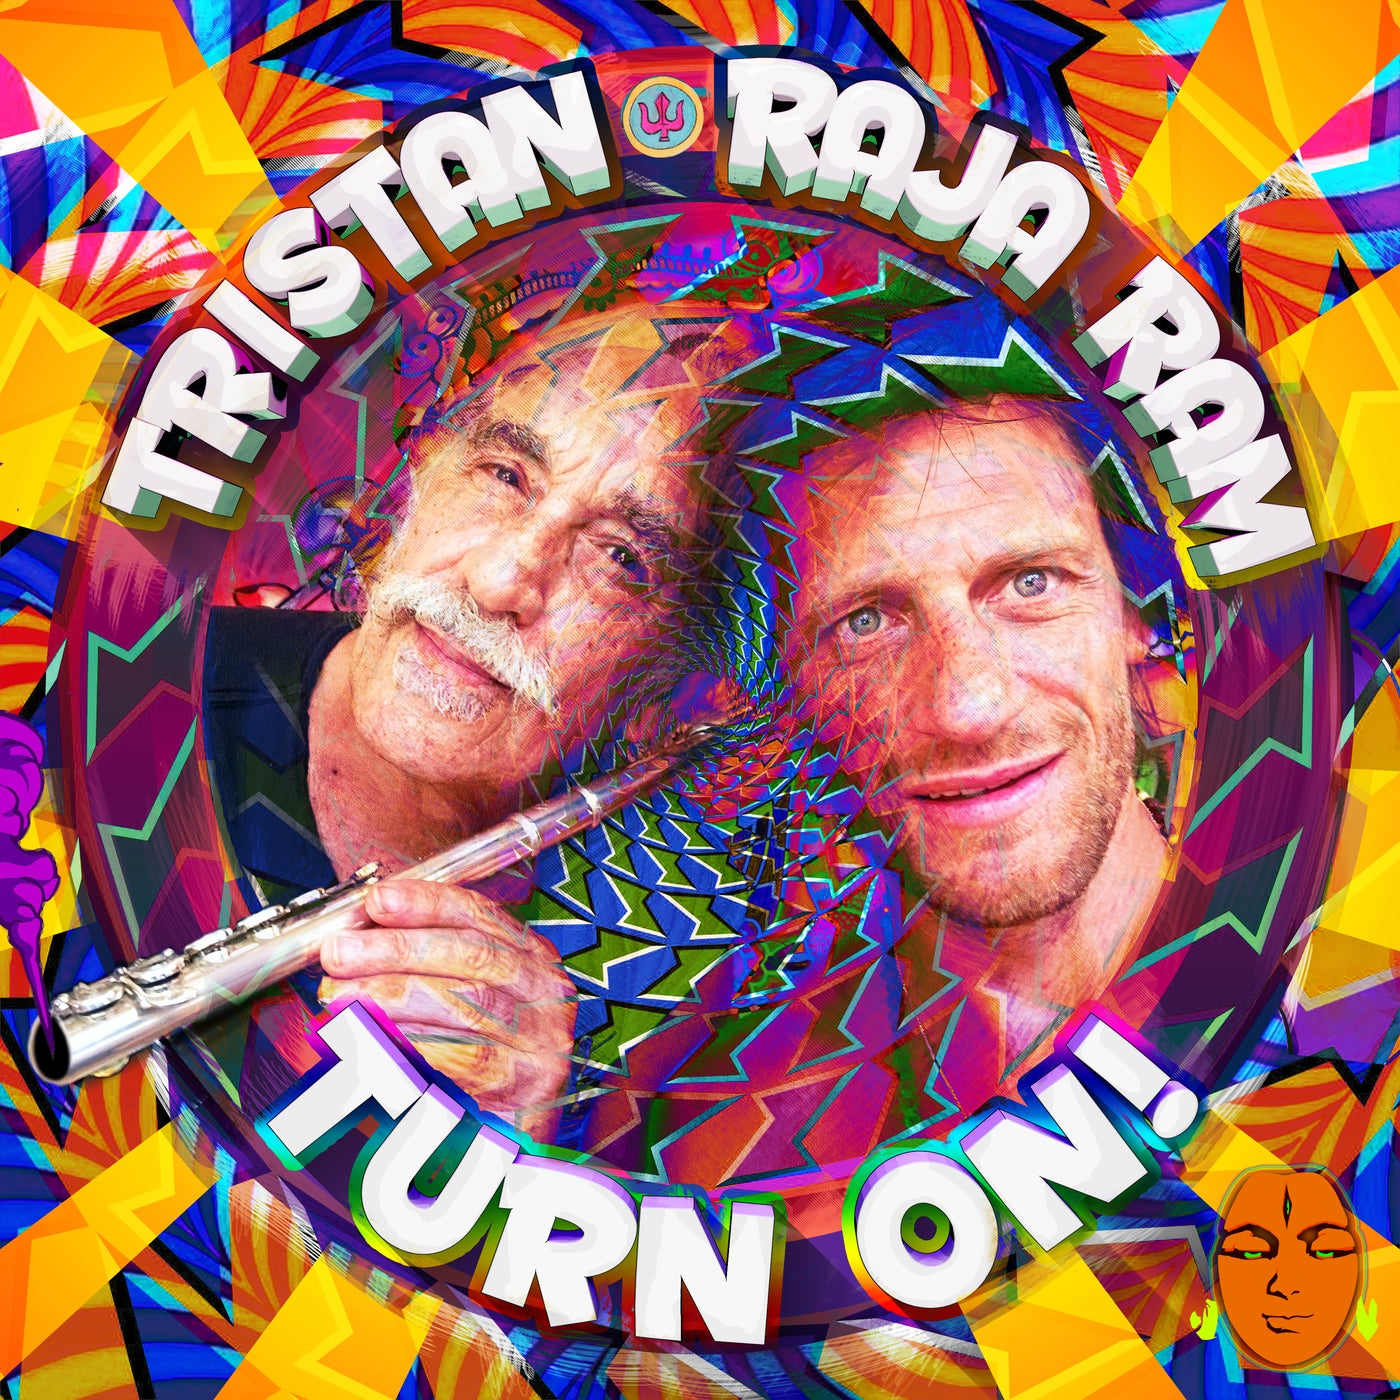 Turn On! (Original Mix)